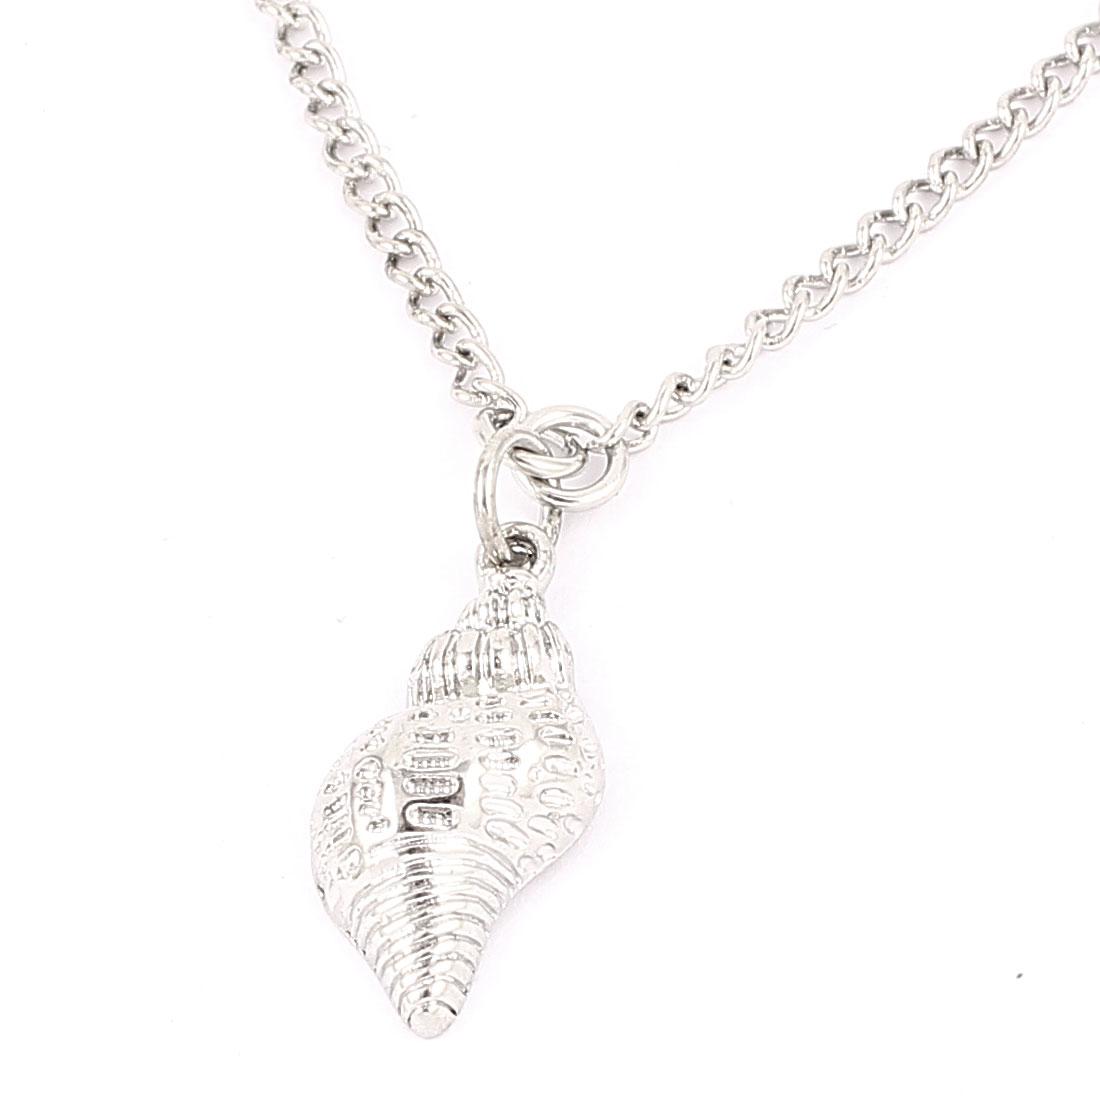 Ladies Women Metal Conch Design Pendant Lobster Buckle Strip Link Slim Chain Necklace Neckwear Collar Silver Tone